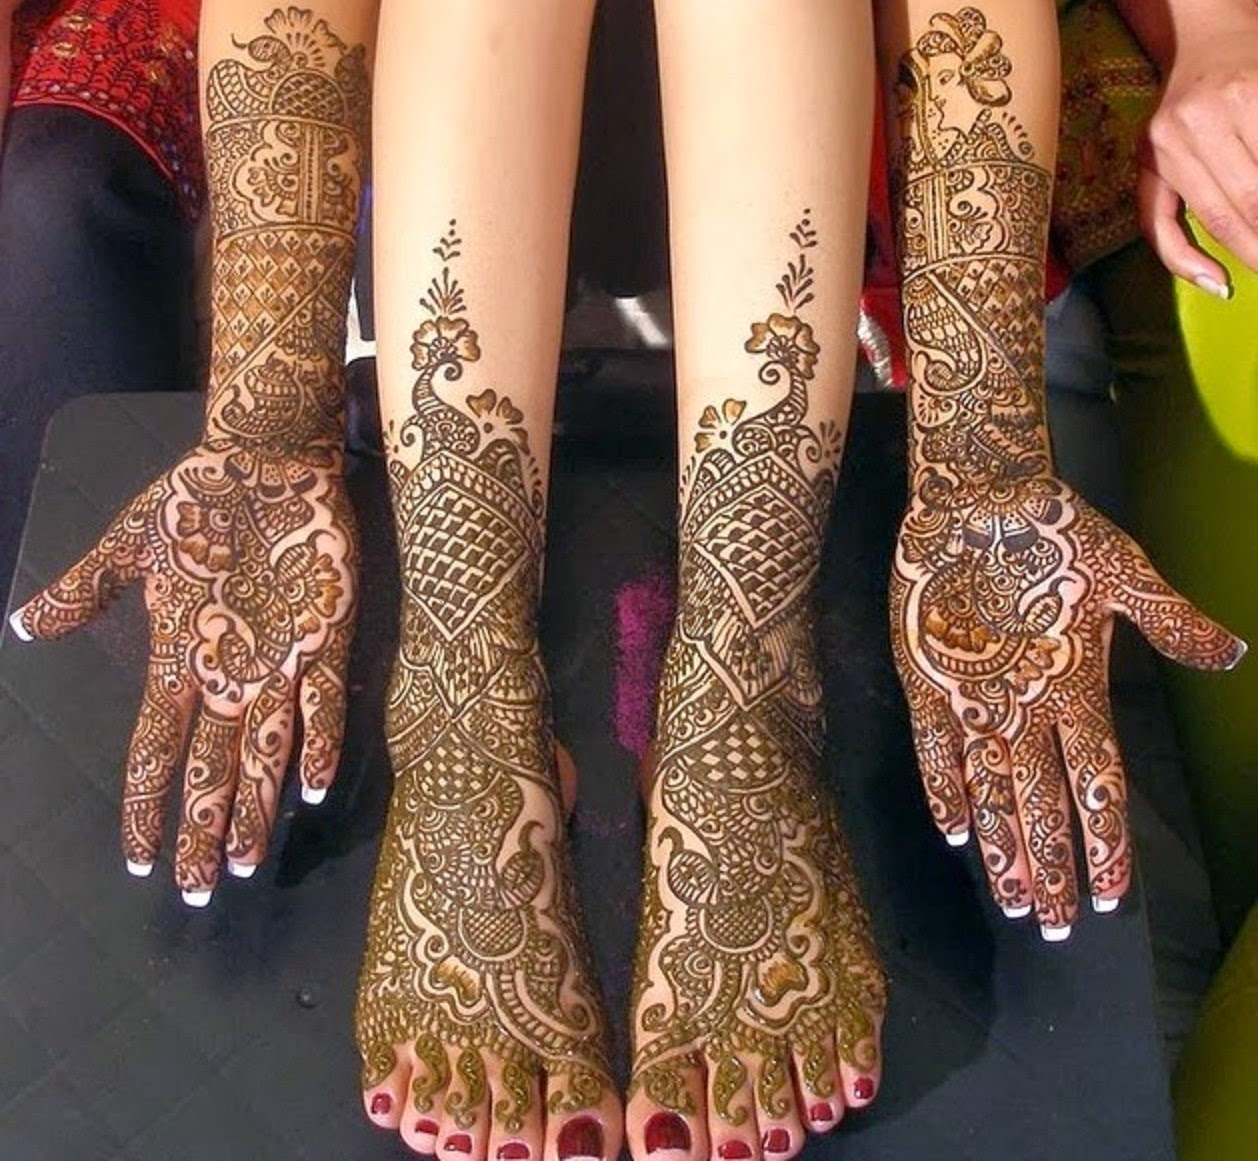 Bridal Mehndi Designs: New Bridal Feet and Hand Mehndi